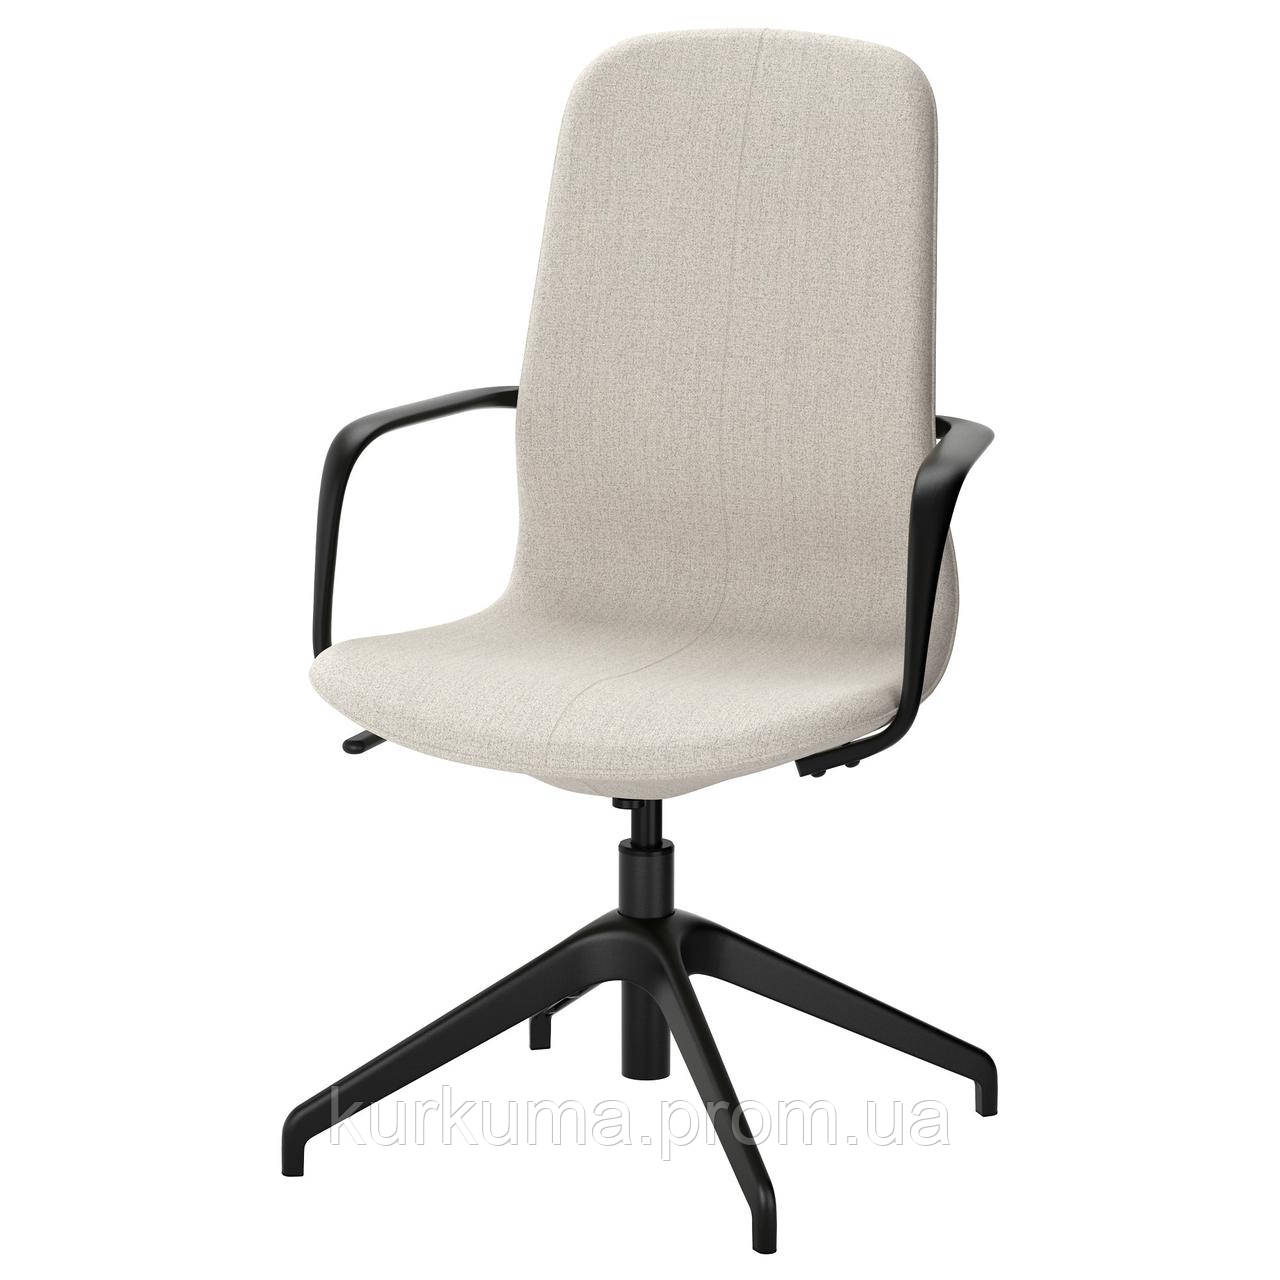 IKEA LANGFJALL Рабочий стул, бежевый, черный  (191.763.01)